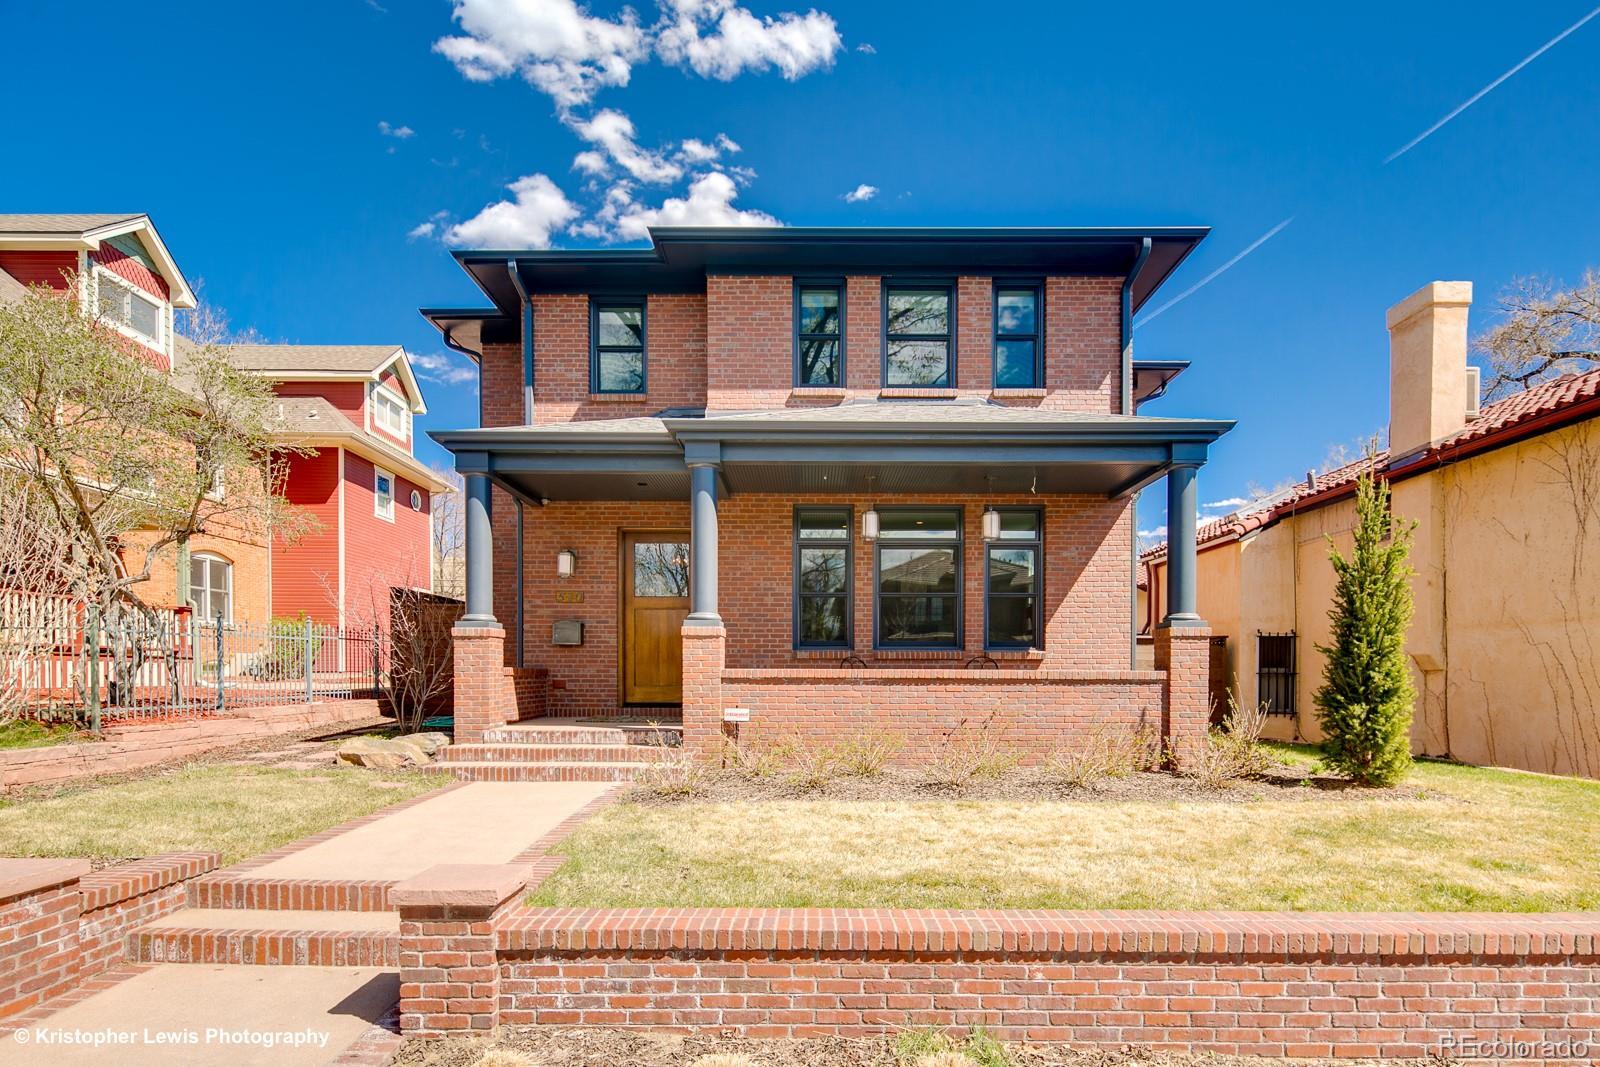 MLS# 3442309 - 1 - 510 N High Street, Denver, CO 80218